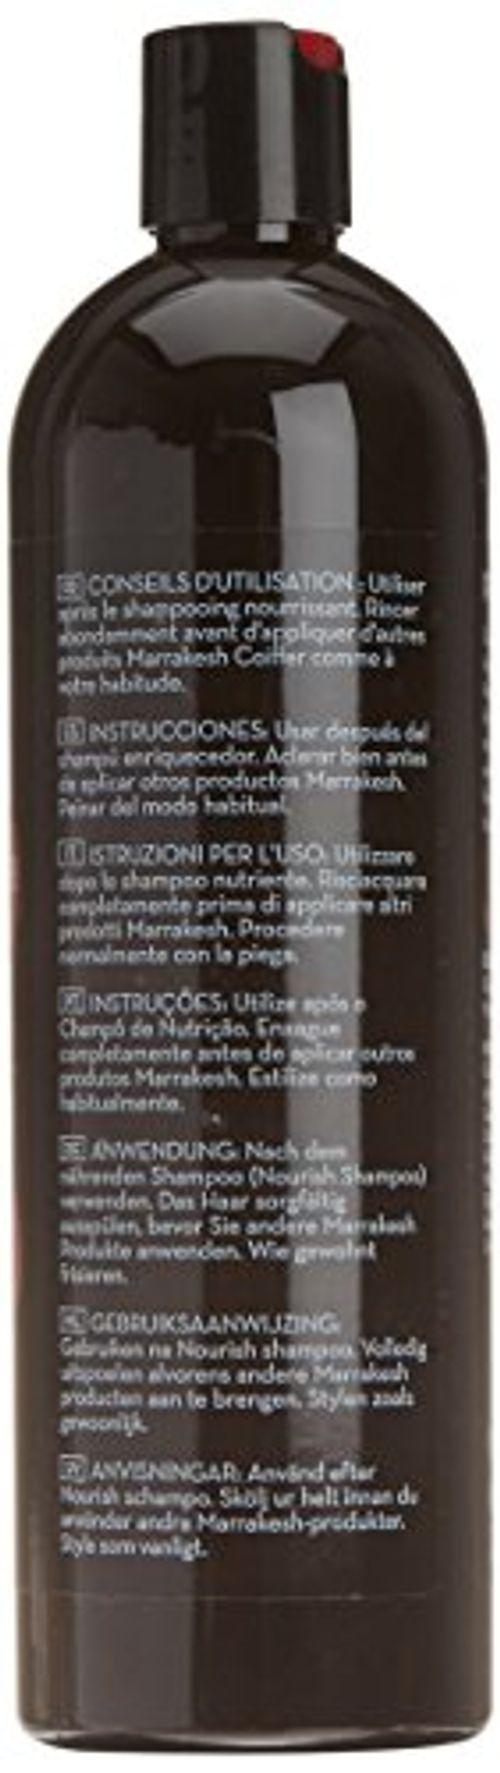 photo Wallpaper of Marrakesh Oil-Marrakesch Öl Hydrate Daily Conditioner, Original 739ml-